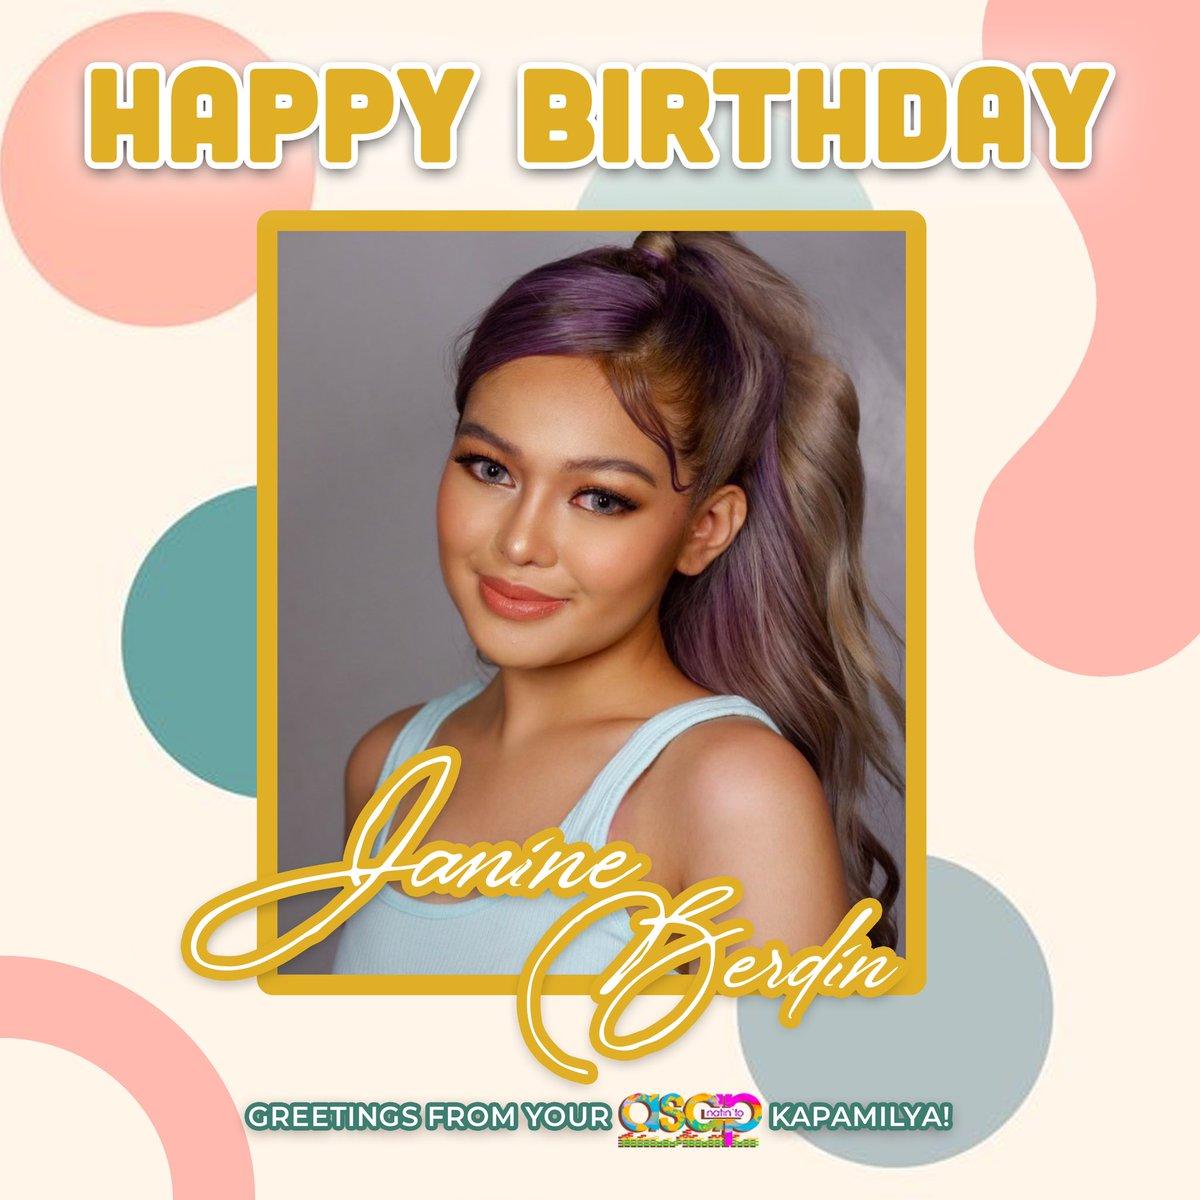 Happy Birthday Janine! We love you! 🥳